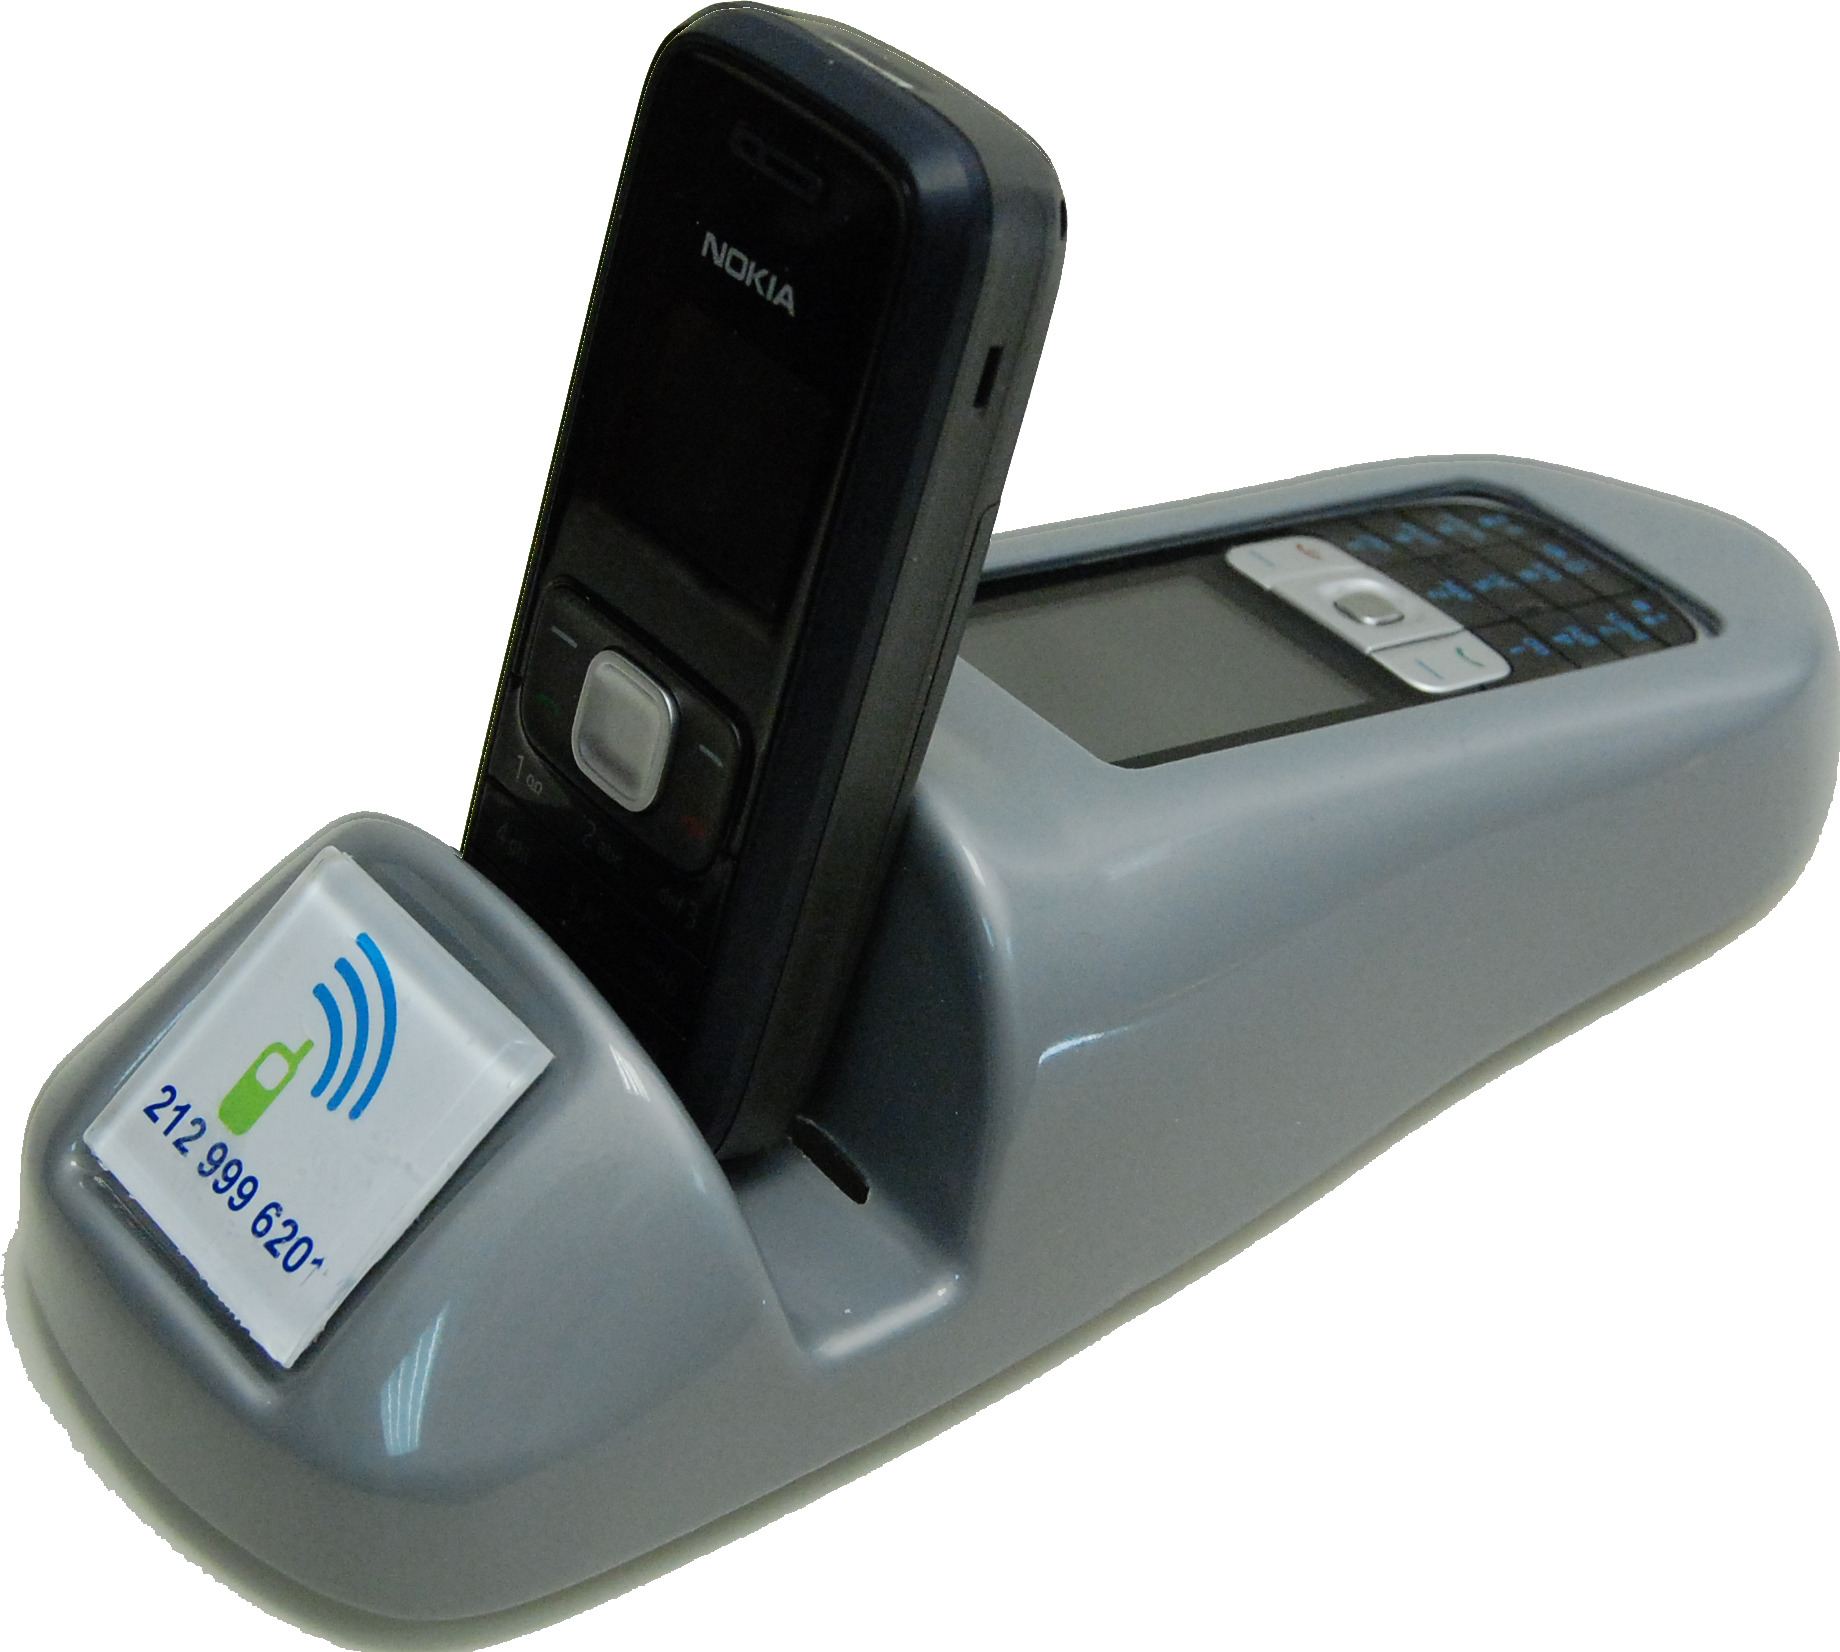 Mobile Payment Terminal